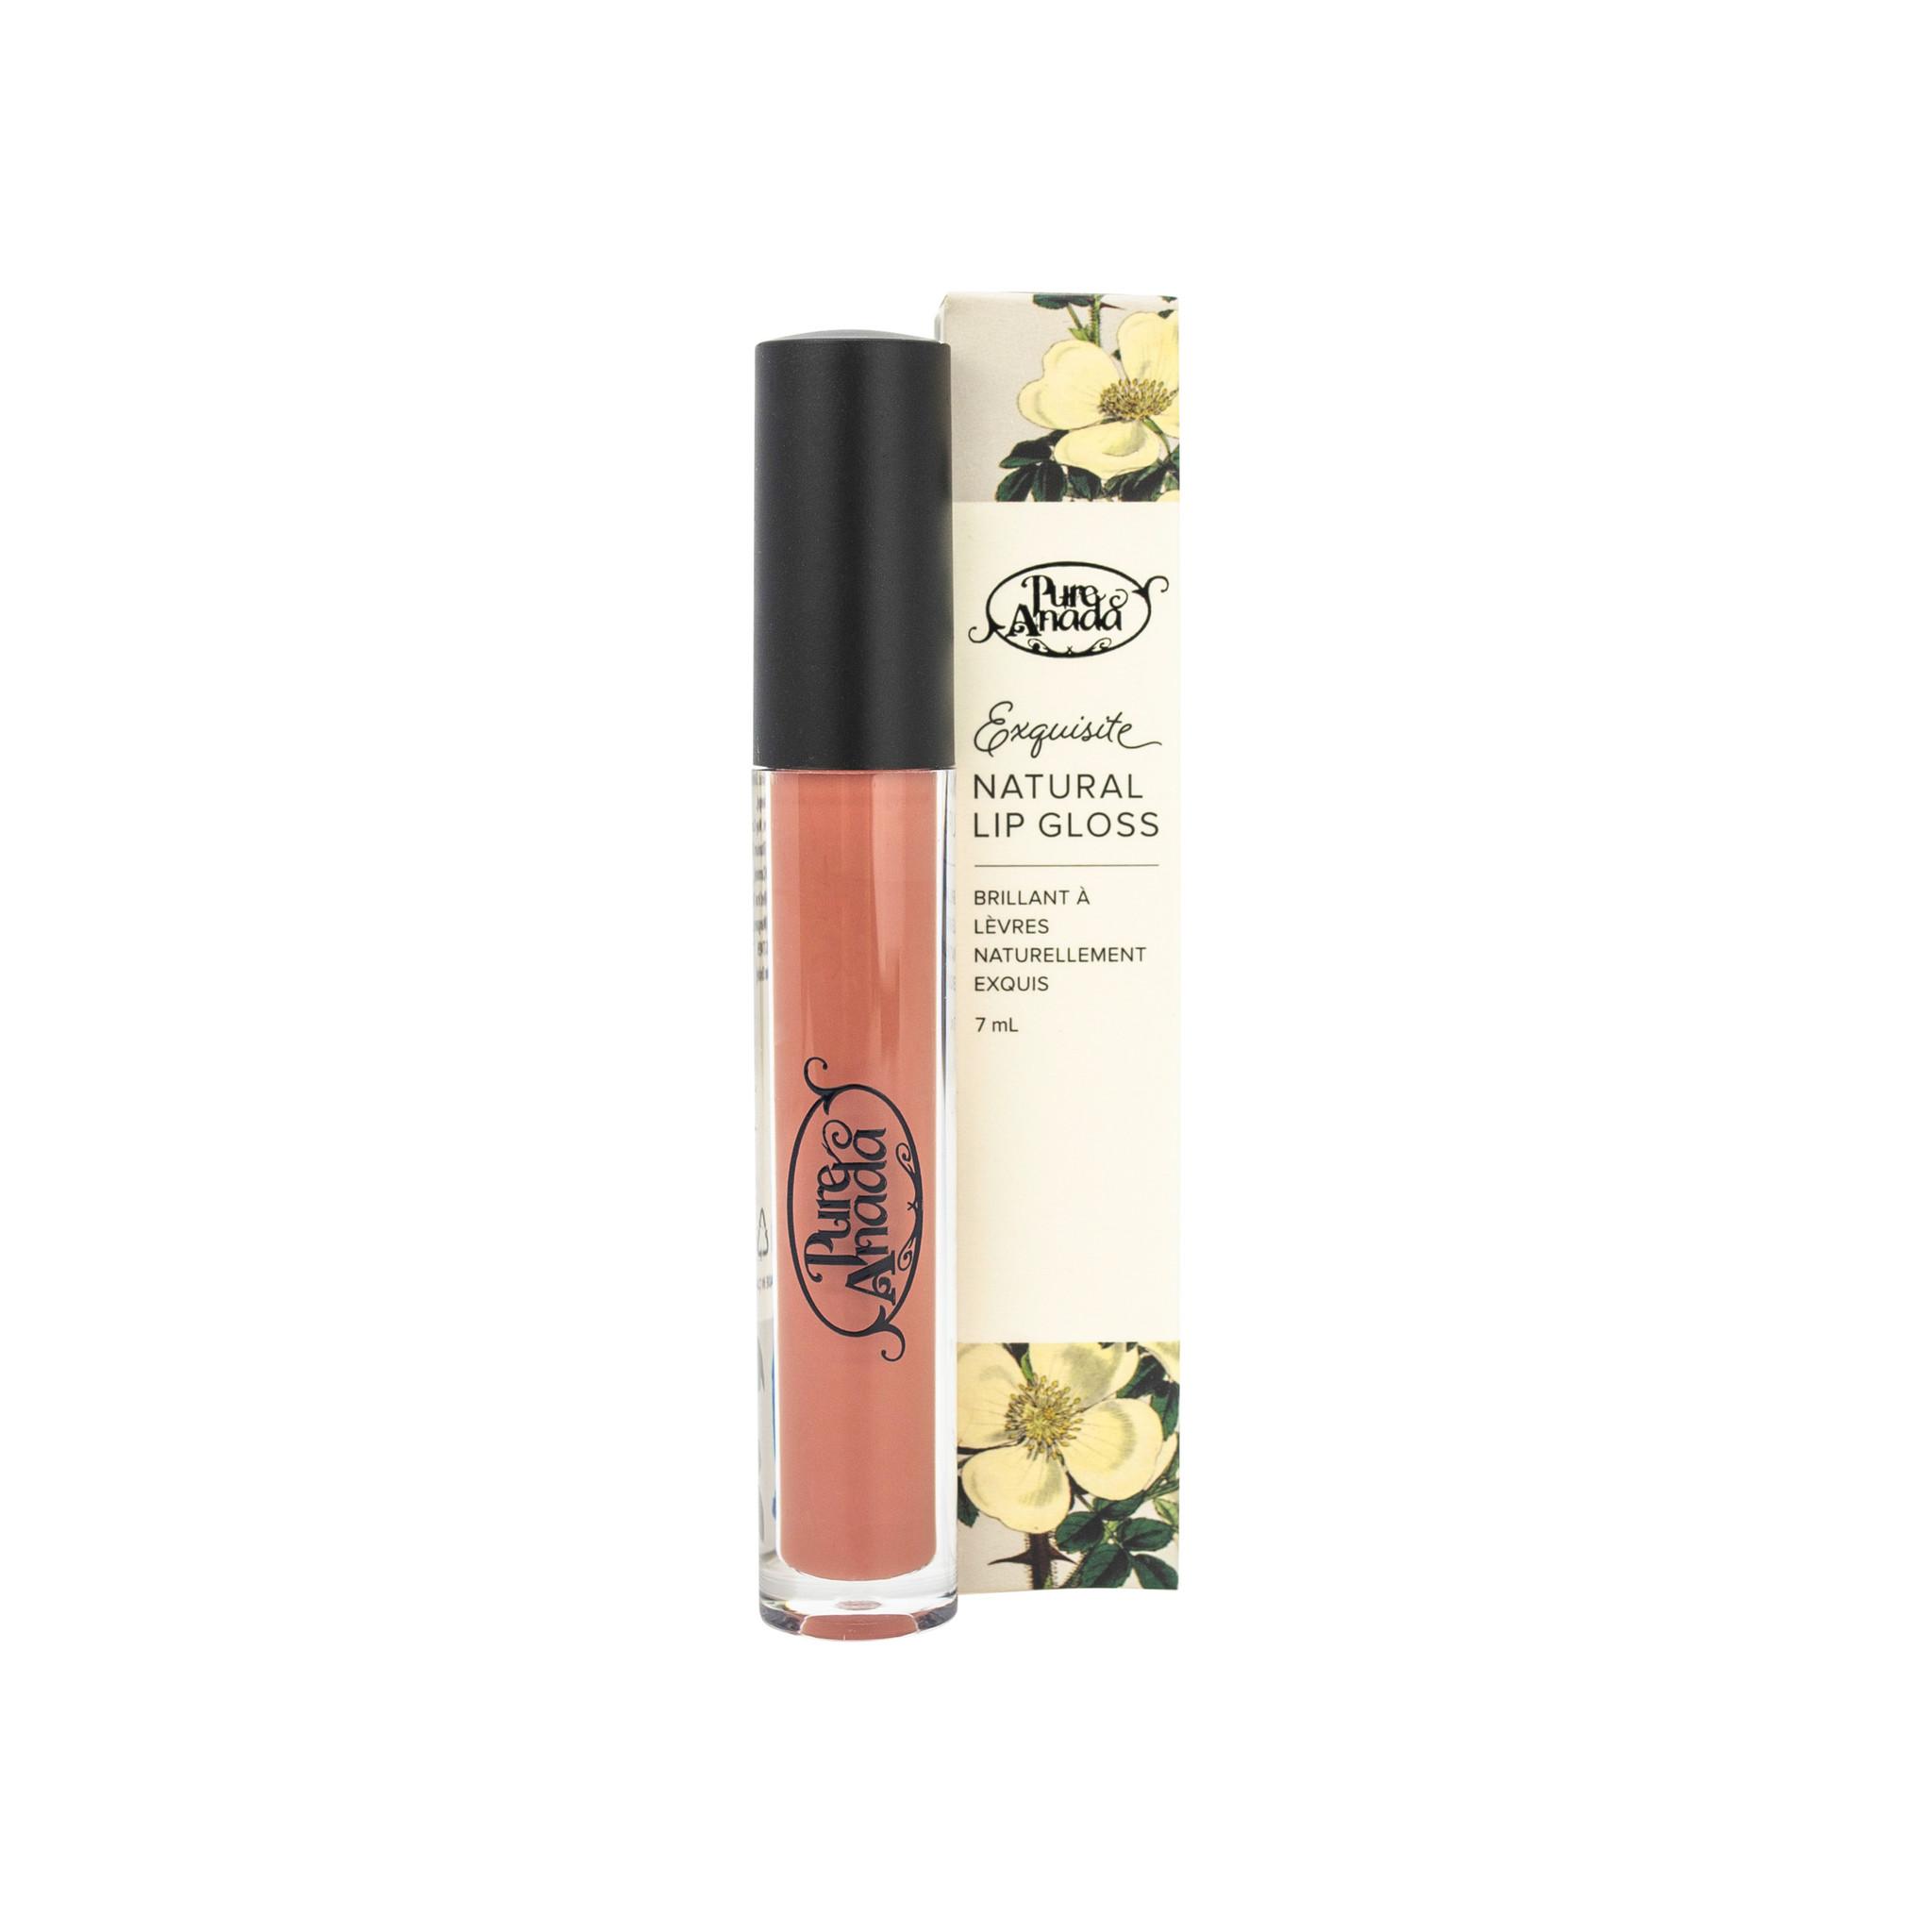 Exquisite Natural Lip Gloss - Kiwi (Matte)-1